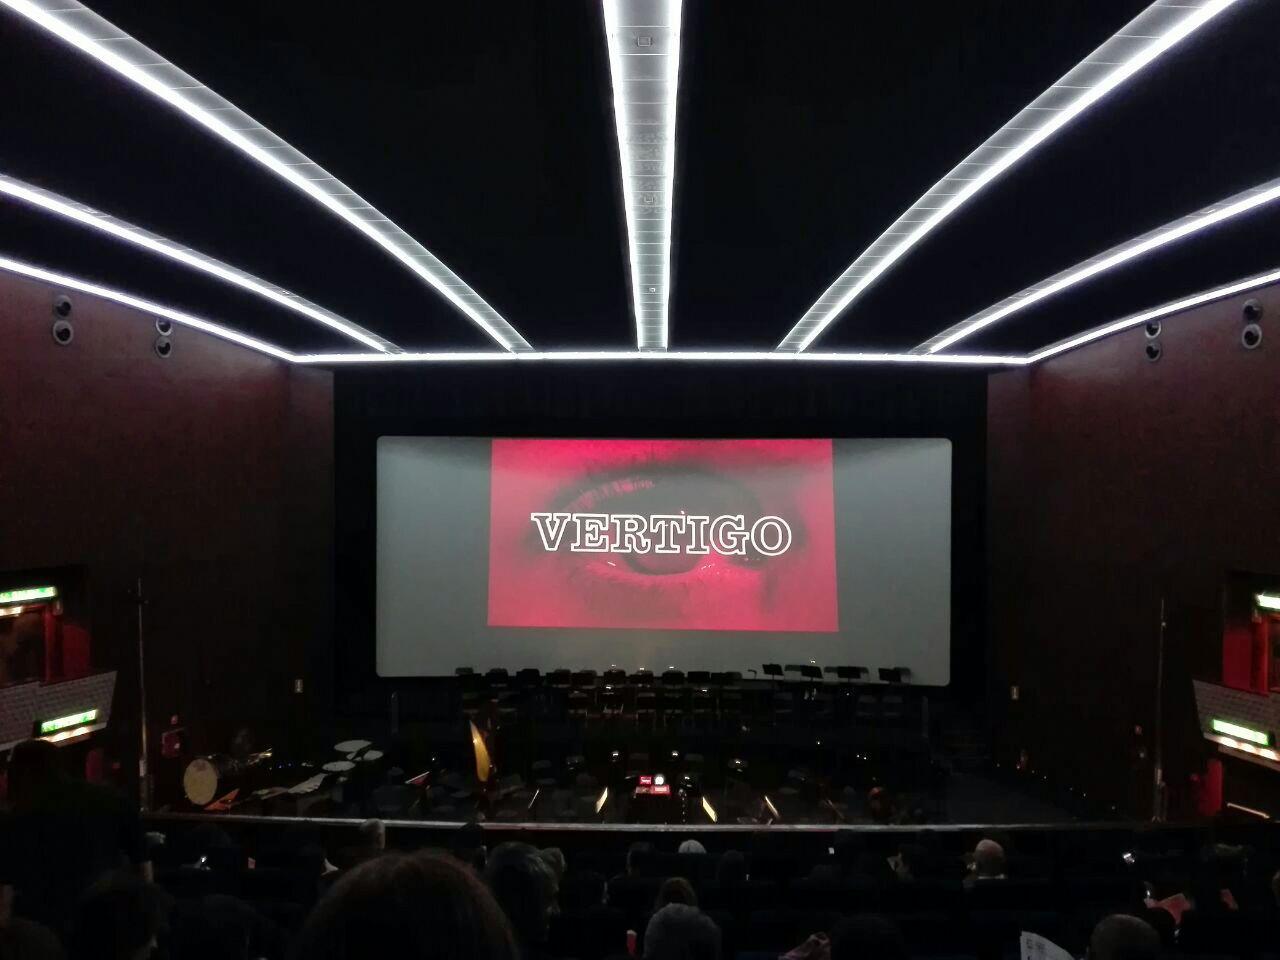 Vertigo-Film-Con orquesta-Cine Palafox-Zaragoza